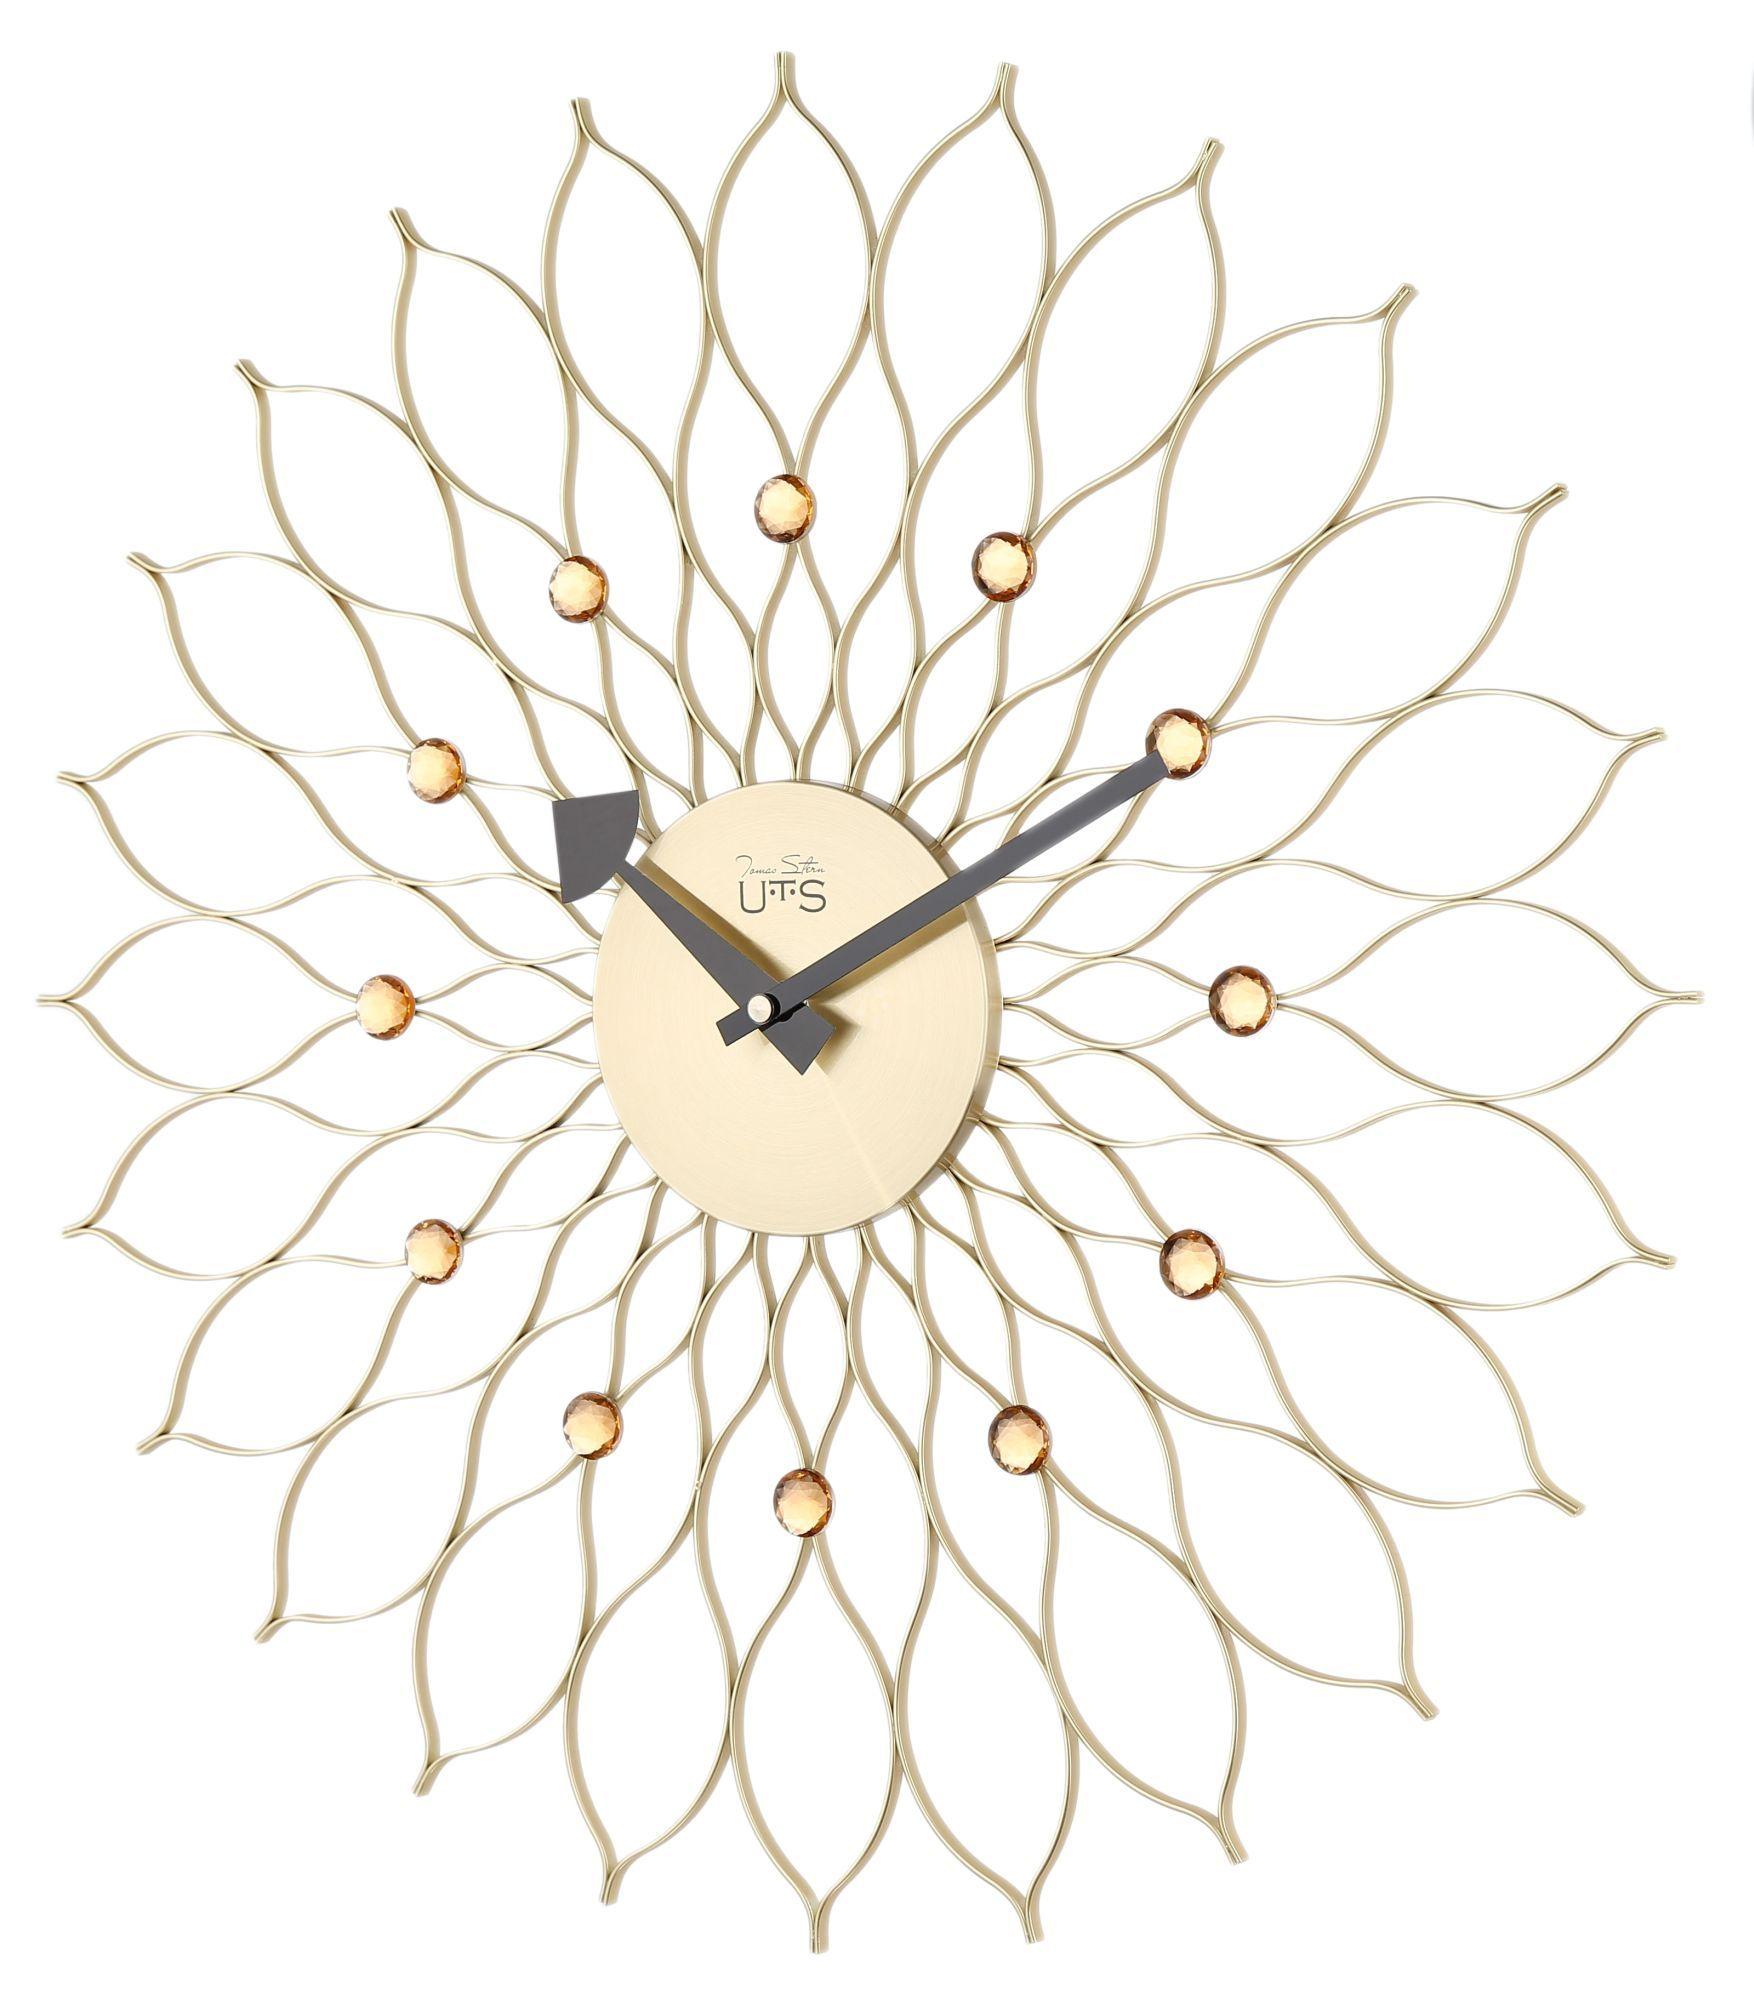 Часы настенные Часы настенные Tomas Stern 8018 chasy-nastennye-tomas-stern-8018-germaniya.jpg